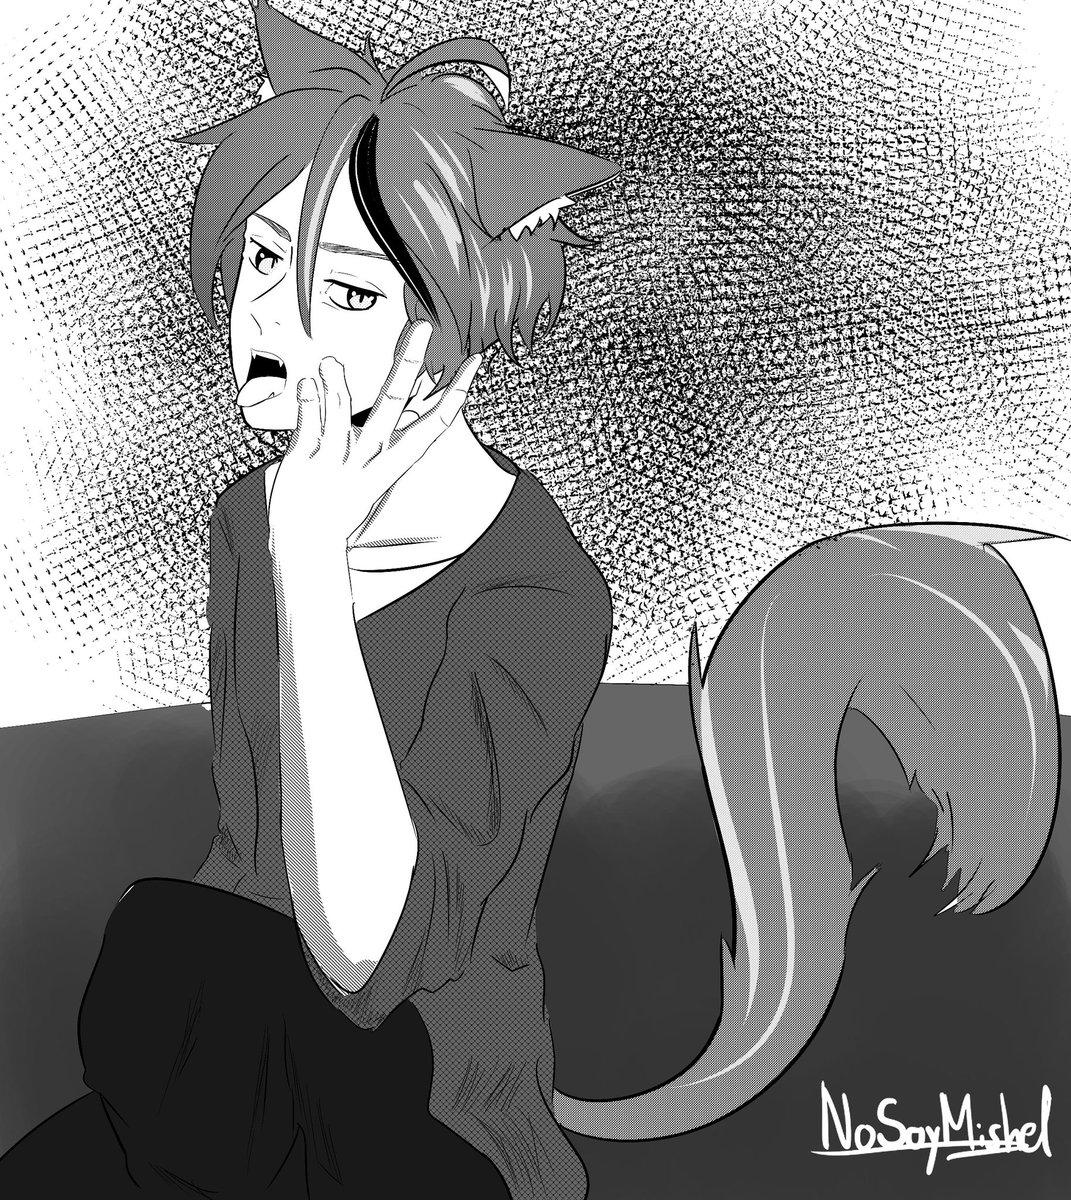 Lyon normalito Intenté experimentar con el blanco y negro y las tramas.   #ocart #uwu #animepictures #ClipStudioPaint #animeart #anime #newart #mangaart #blackandwhite #CatBoy #animecat